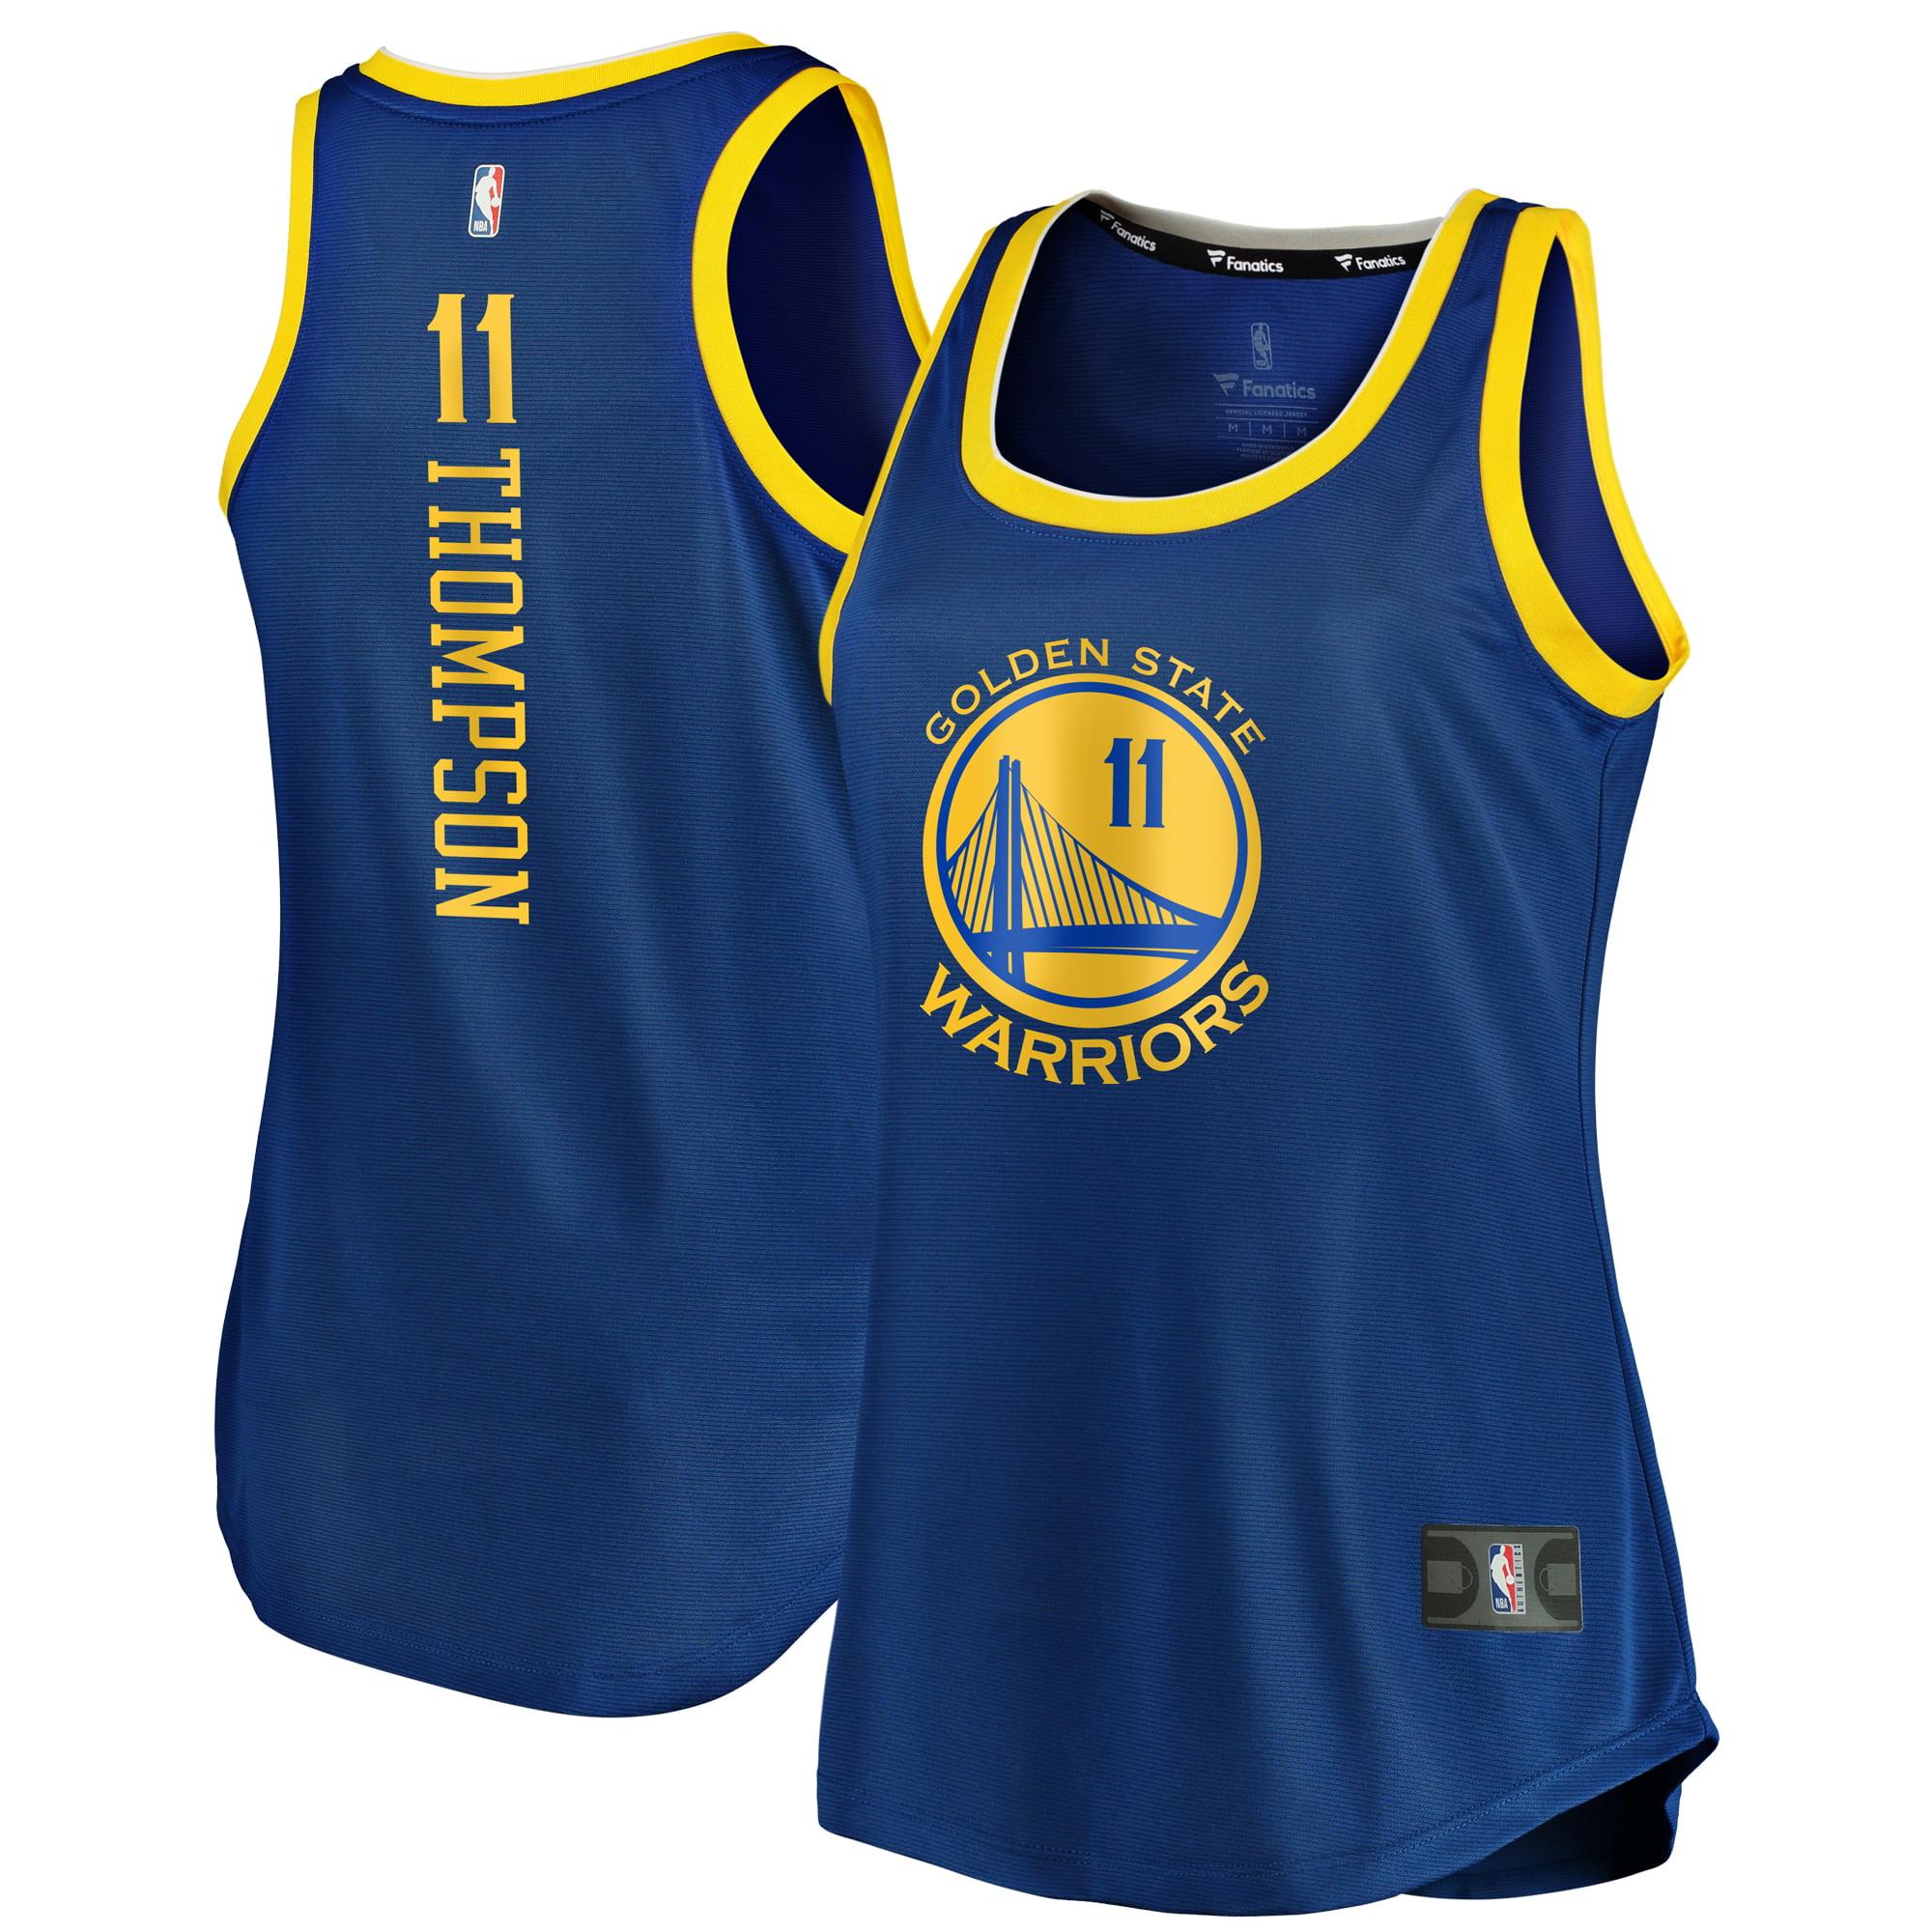 Klay Thompson Golden State Warriors Fanatics Branded Women's Fast Break Tank Jersey - Icon Edition - Royal